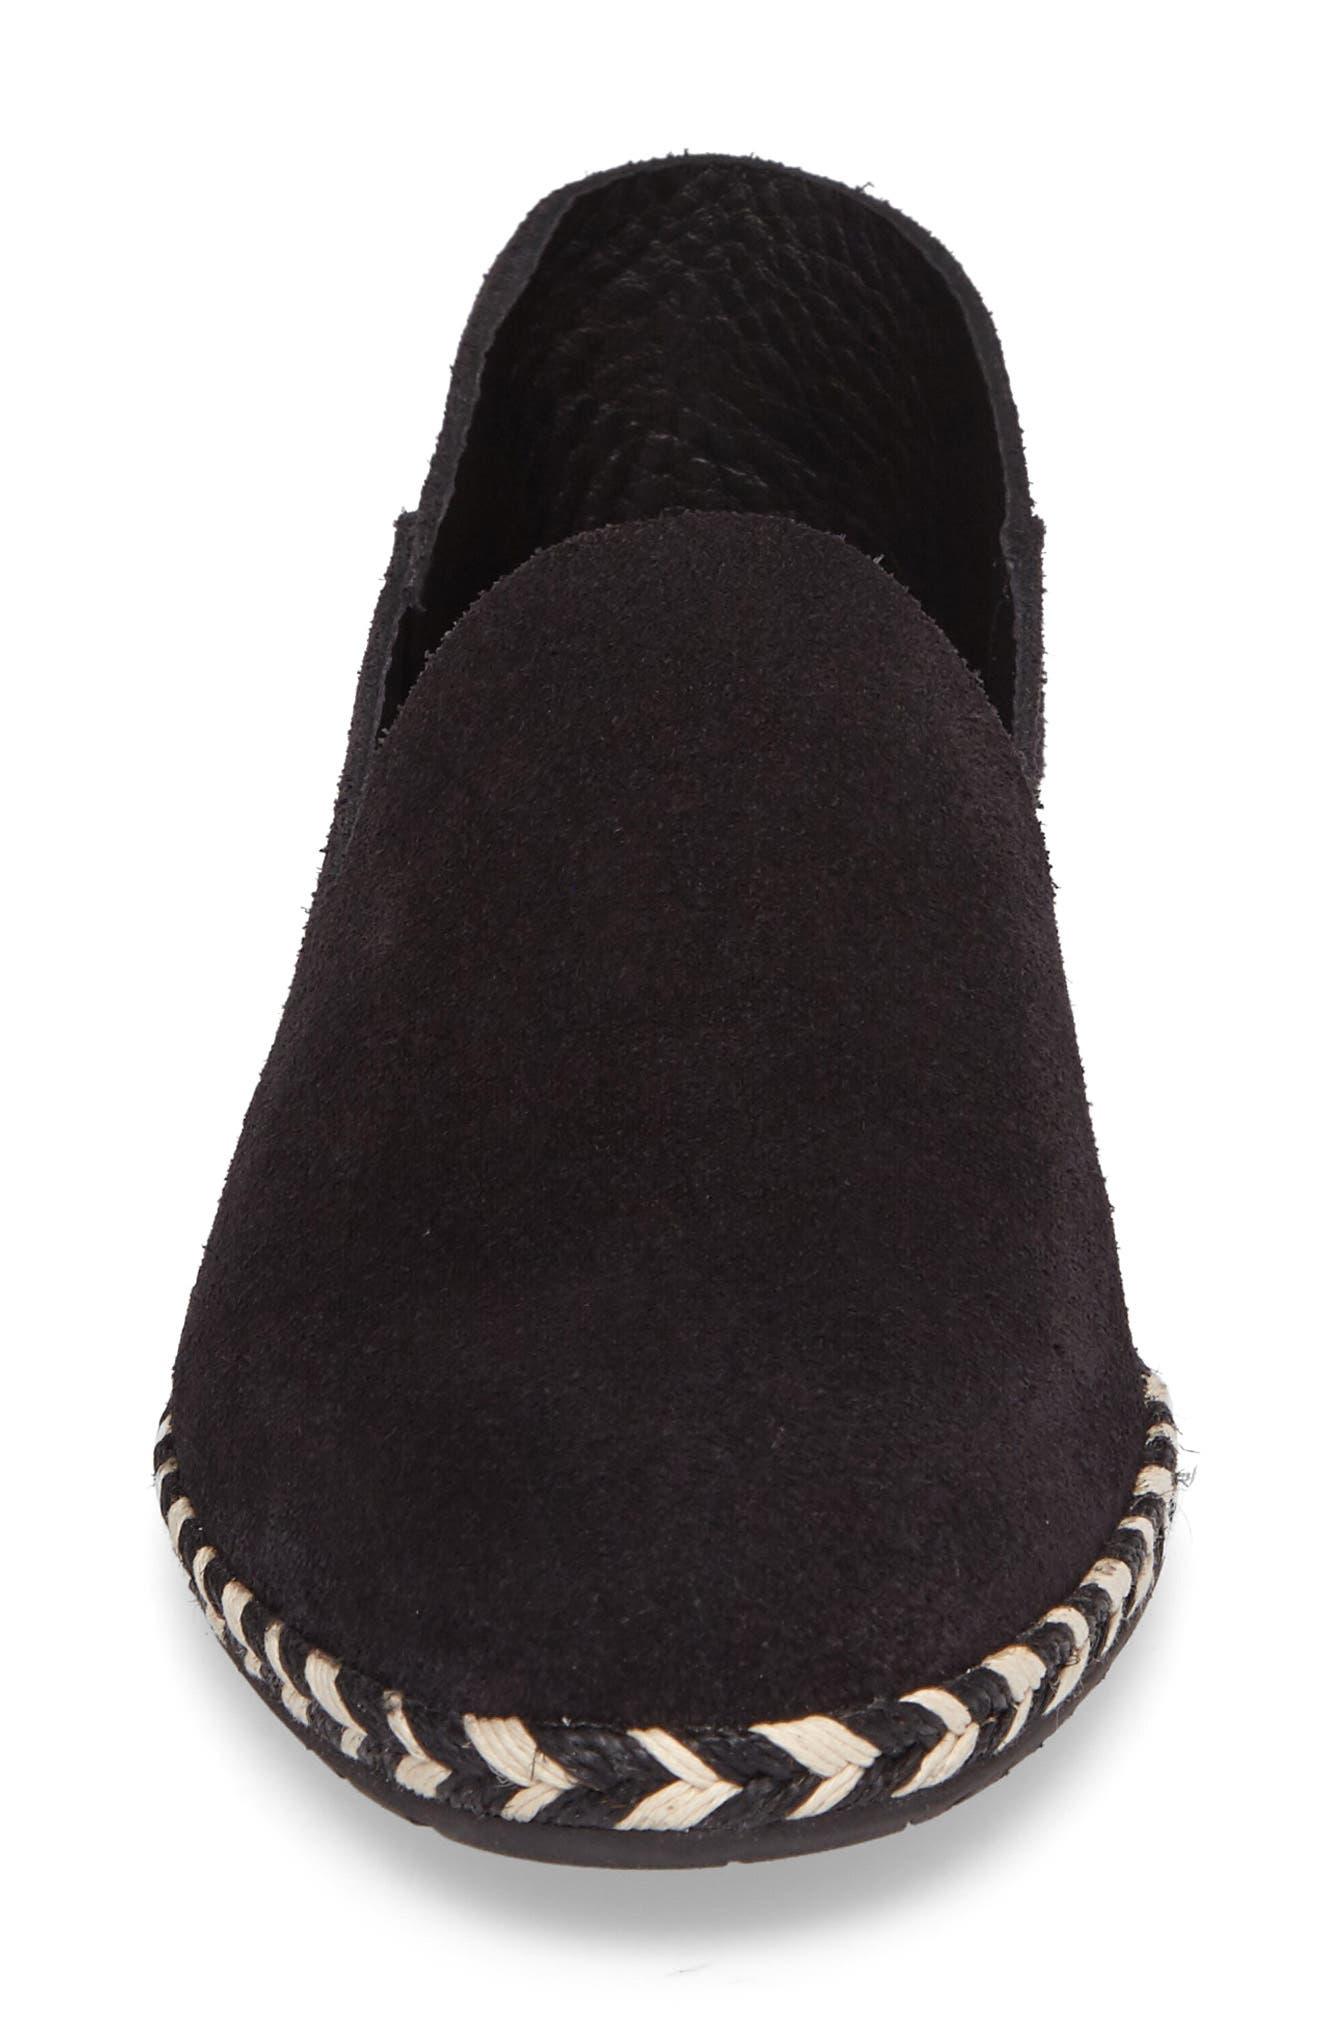 Yuli Convertible Woven Loafer,                             Alternate thumbnail 5, color,                             BLACK